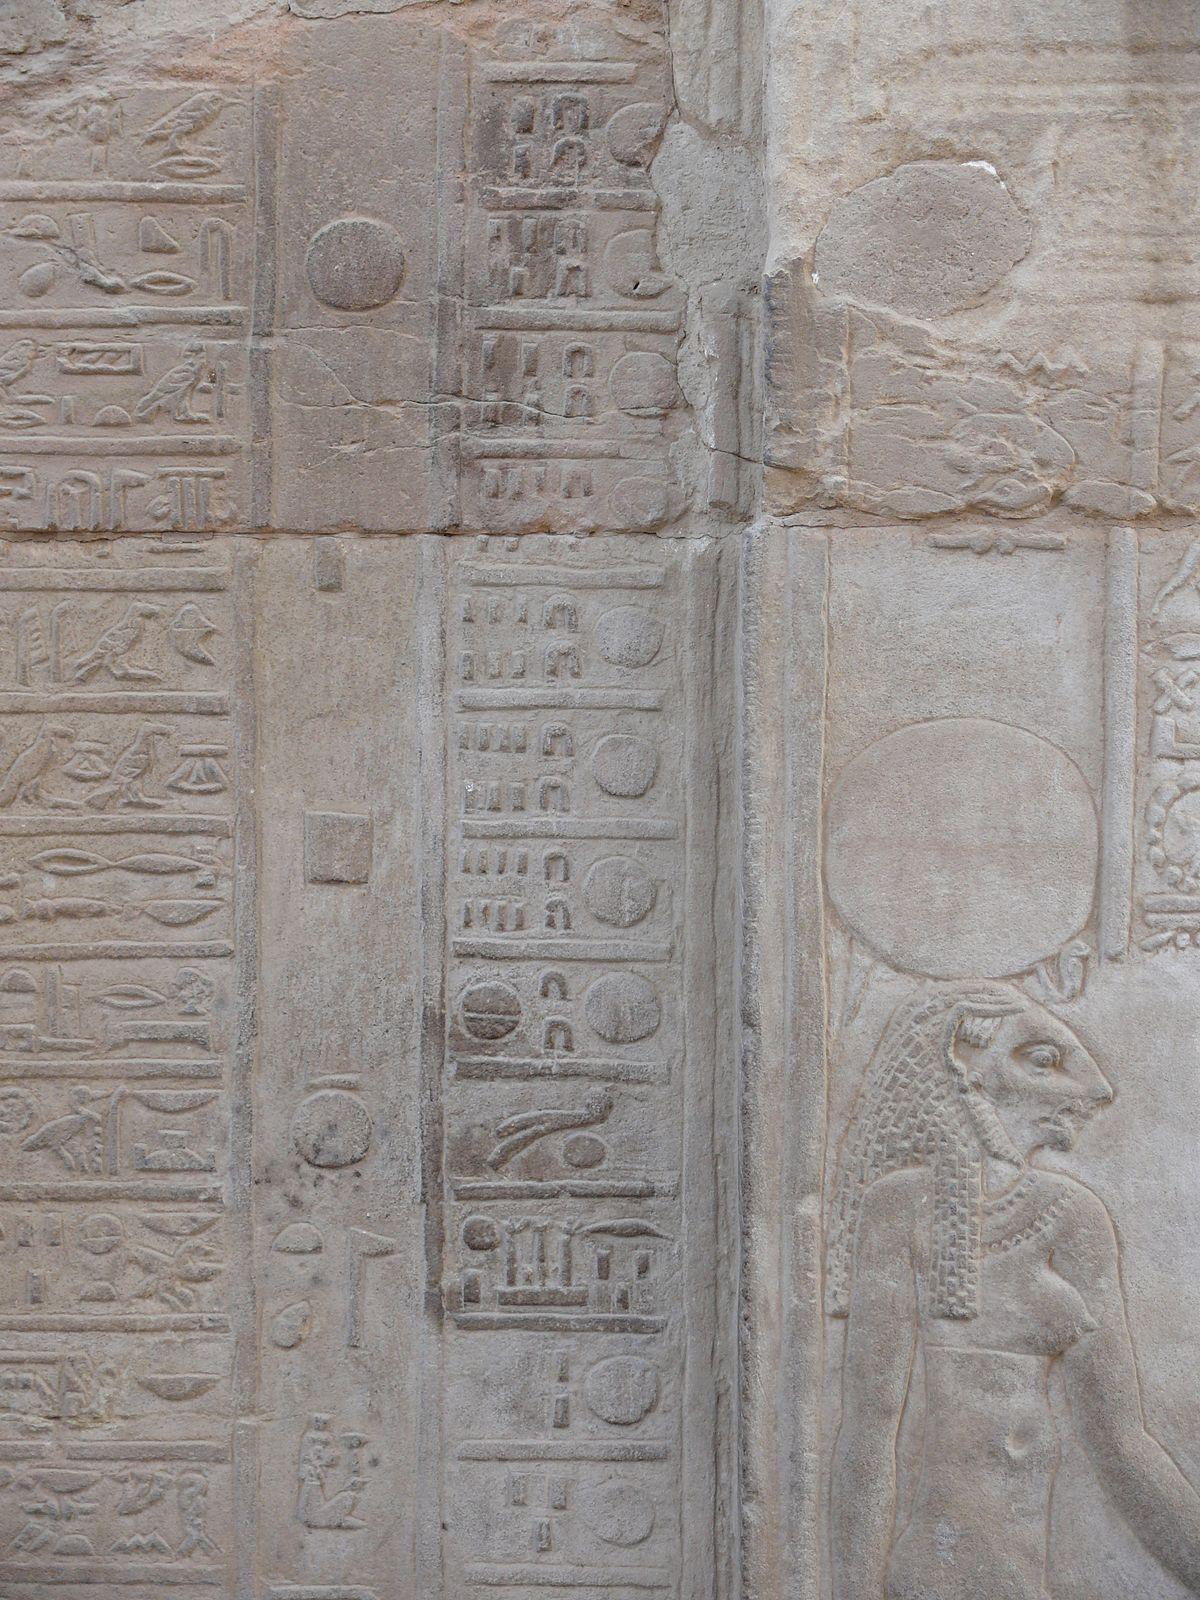 Egyptian Calendar